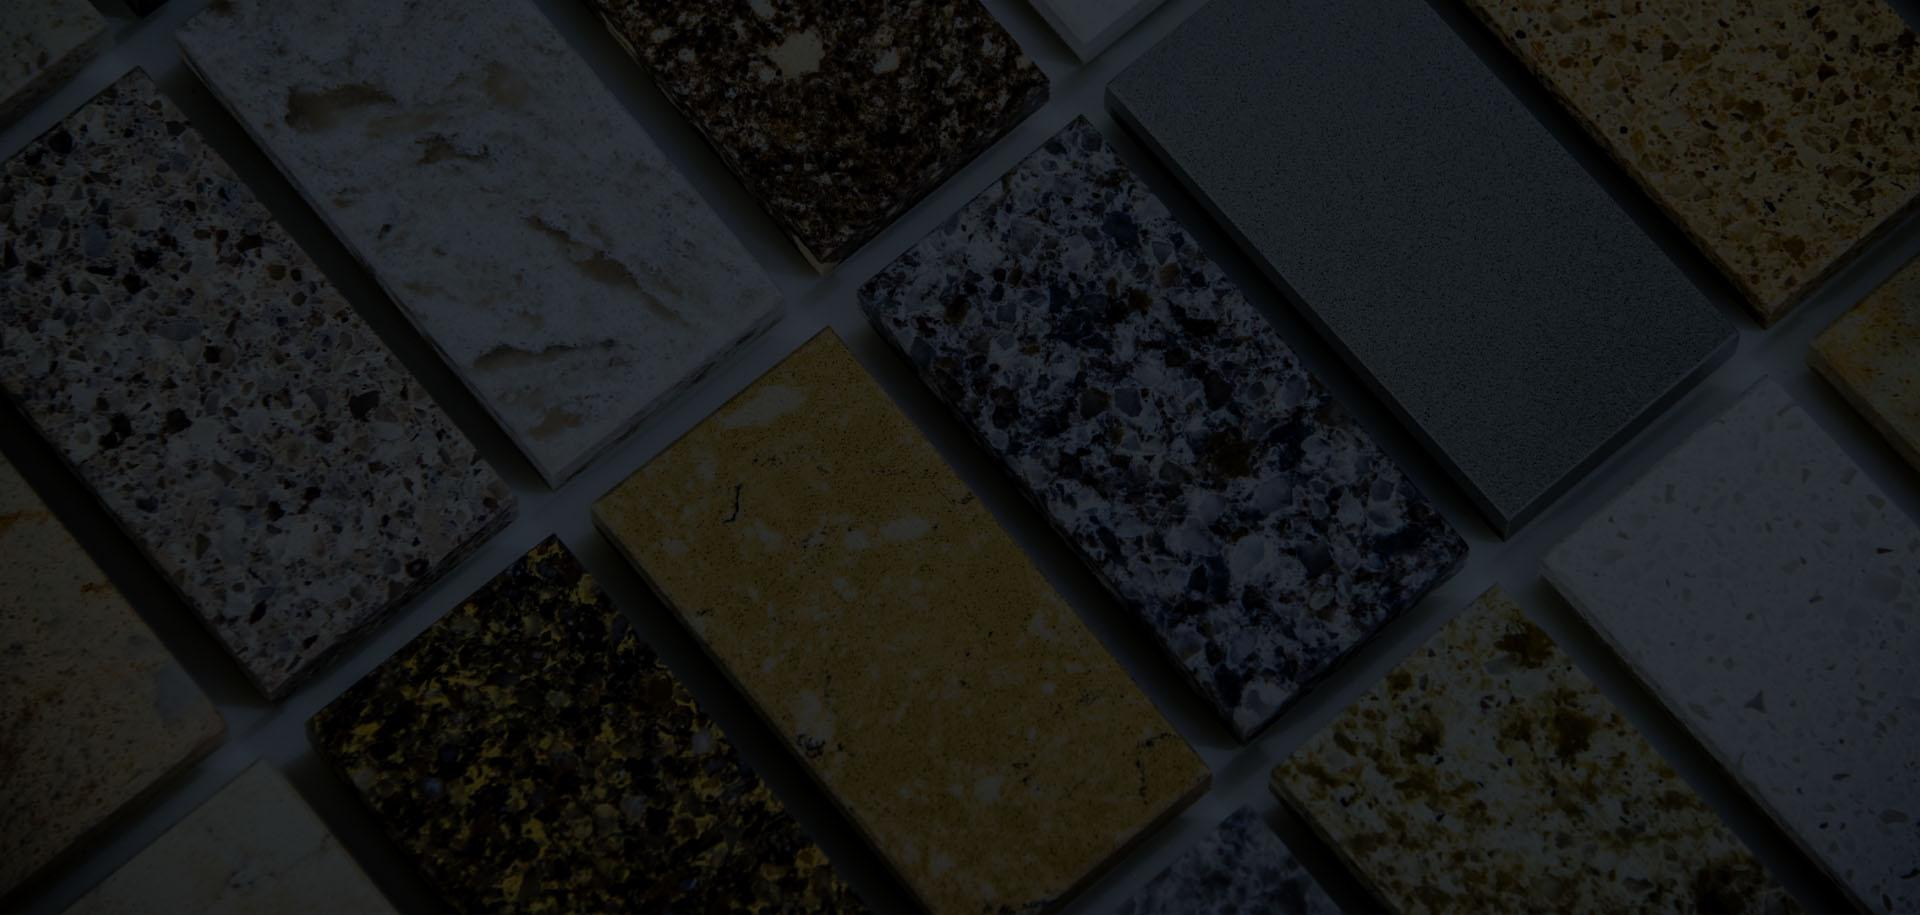 Dark Granite Wallpaper Background Image for Grove Granites in Retford